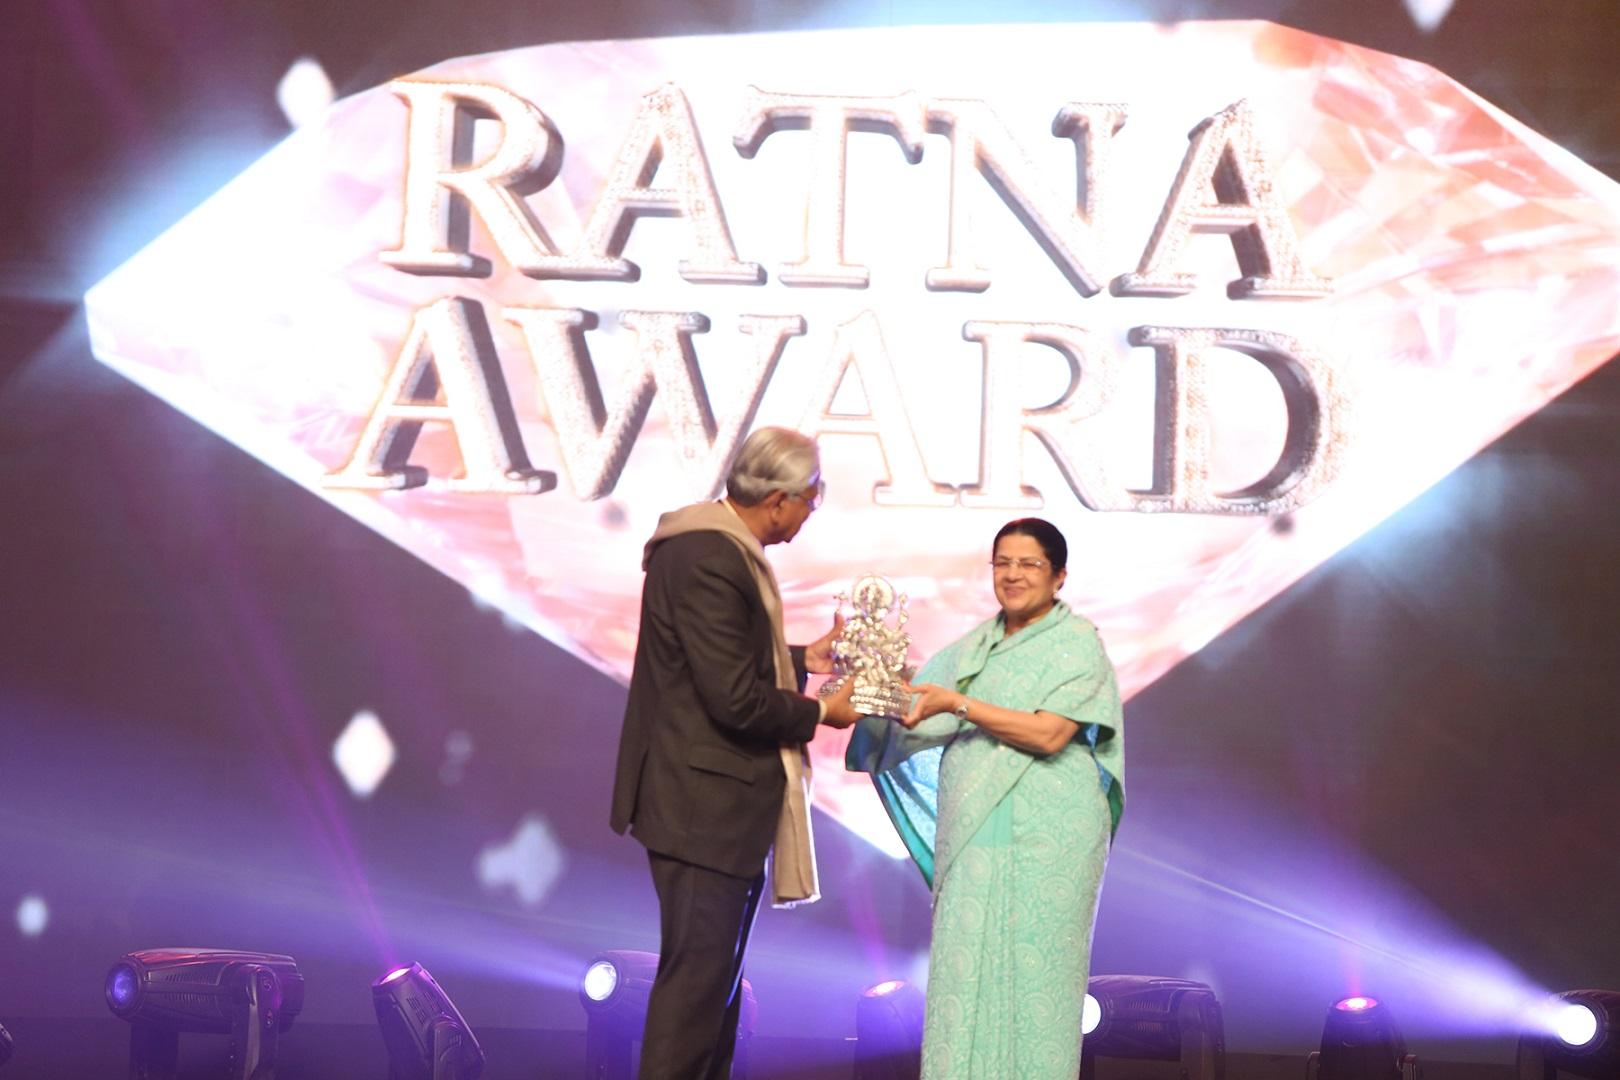 Fountainhead Conceptualises Aditya Birla Awards 2015 - Features an Art Deco-Inspired Setup